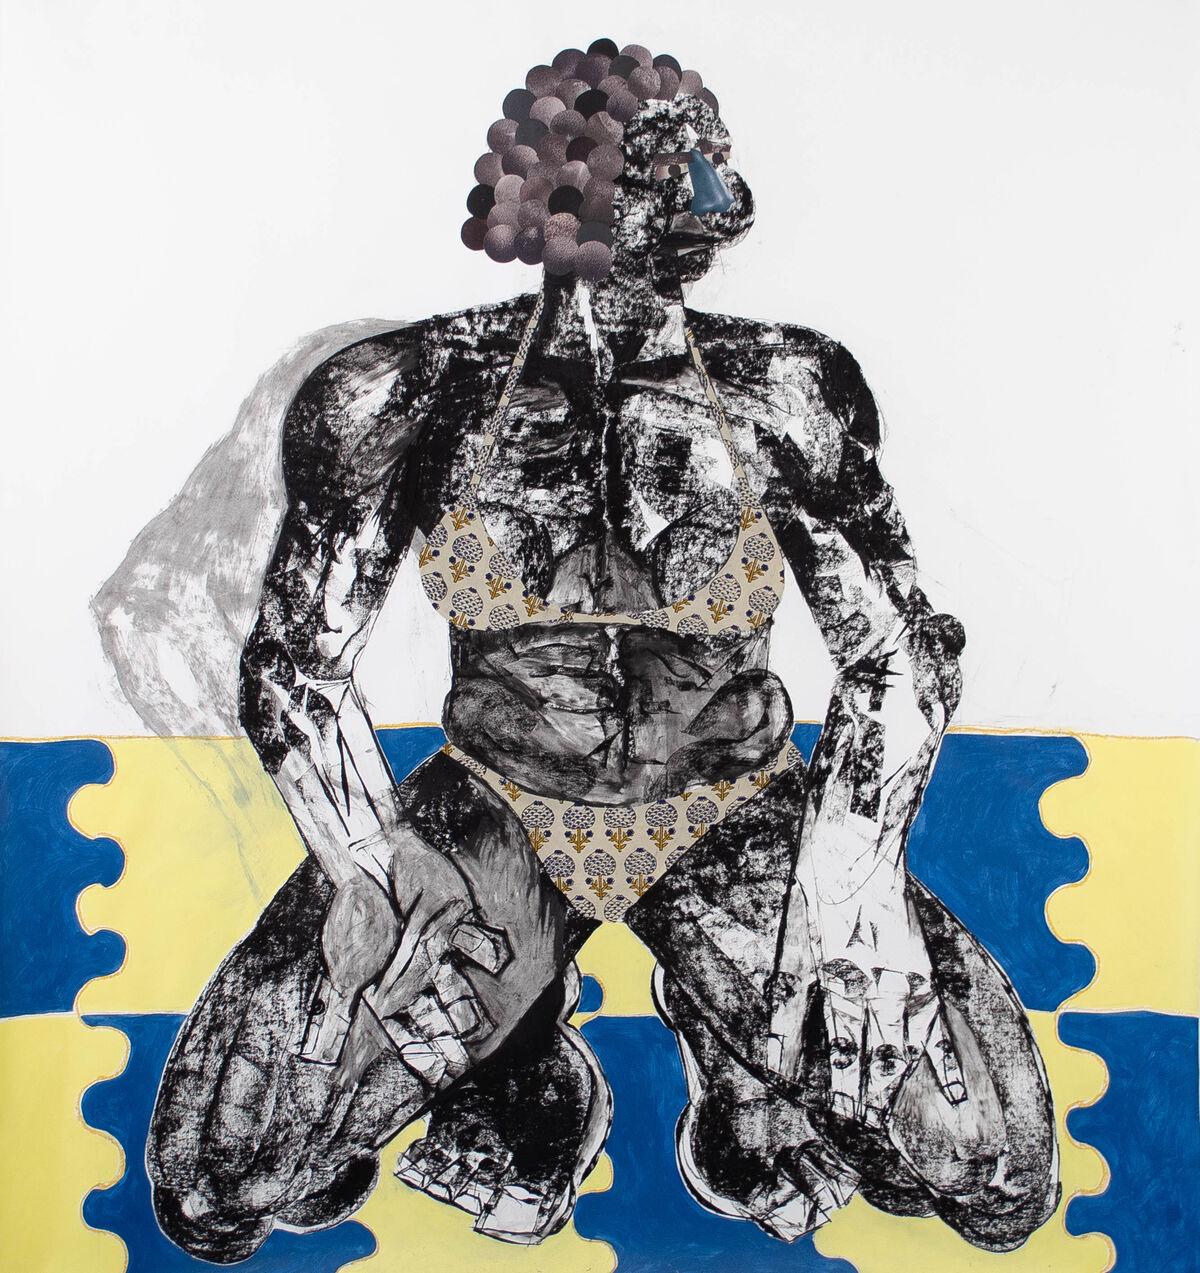 Clotilde Jiménez, Pose No. 7, 2020. Courtesy of the artist and Mariane Ibrahim Gallery.